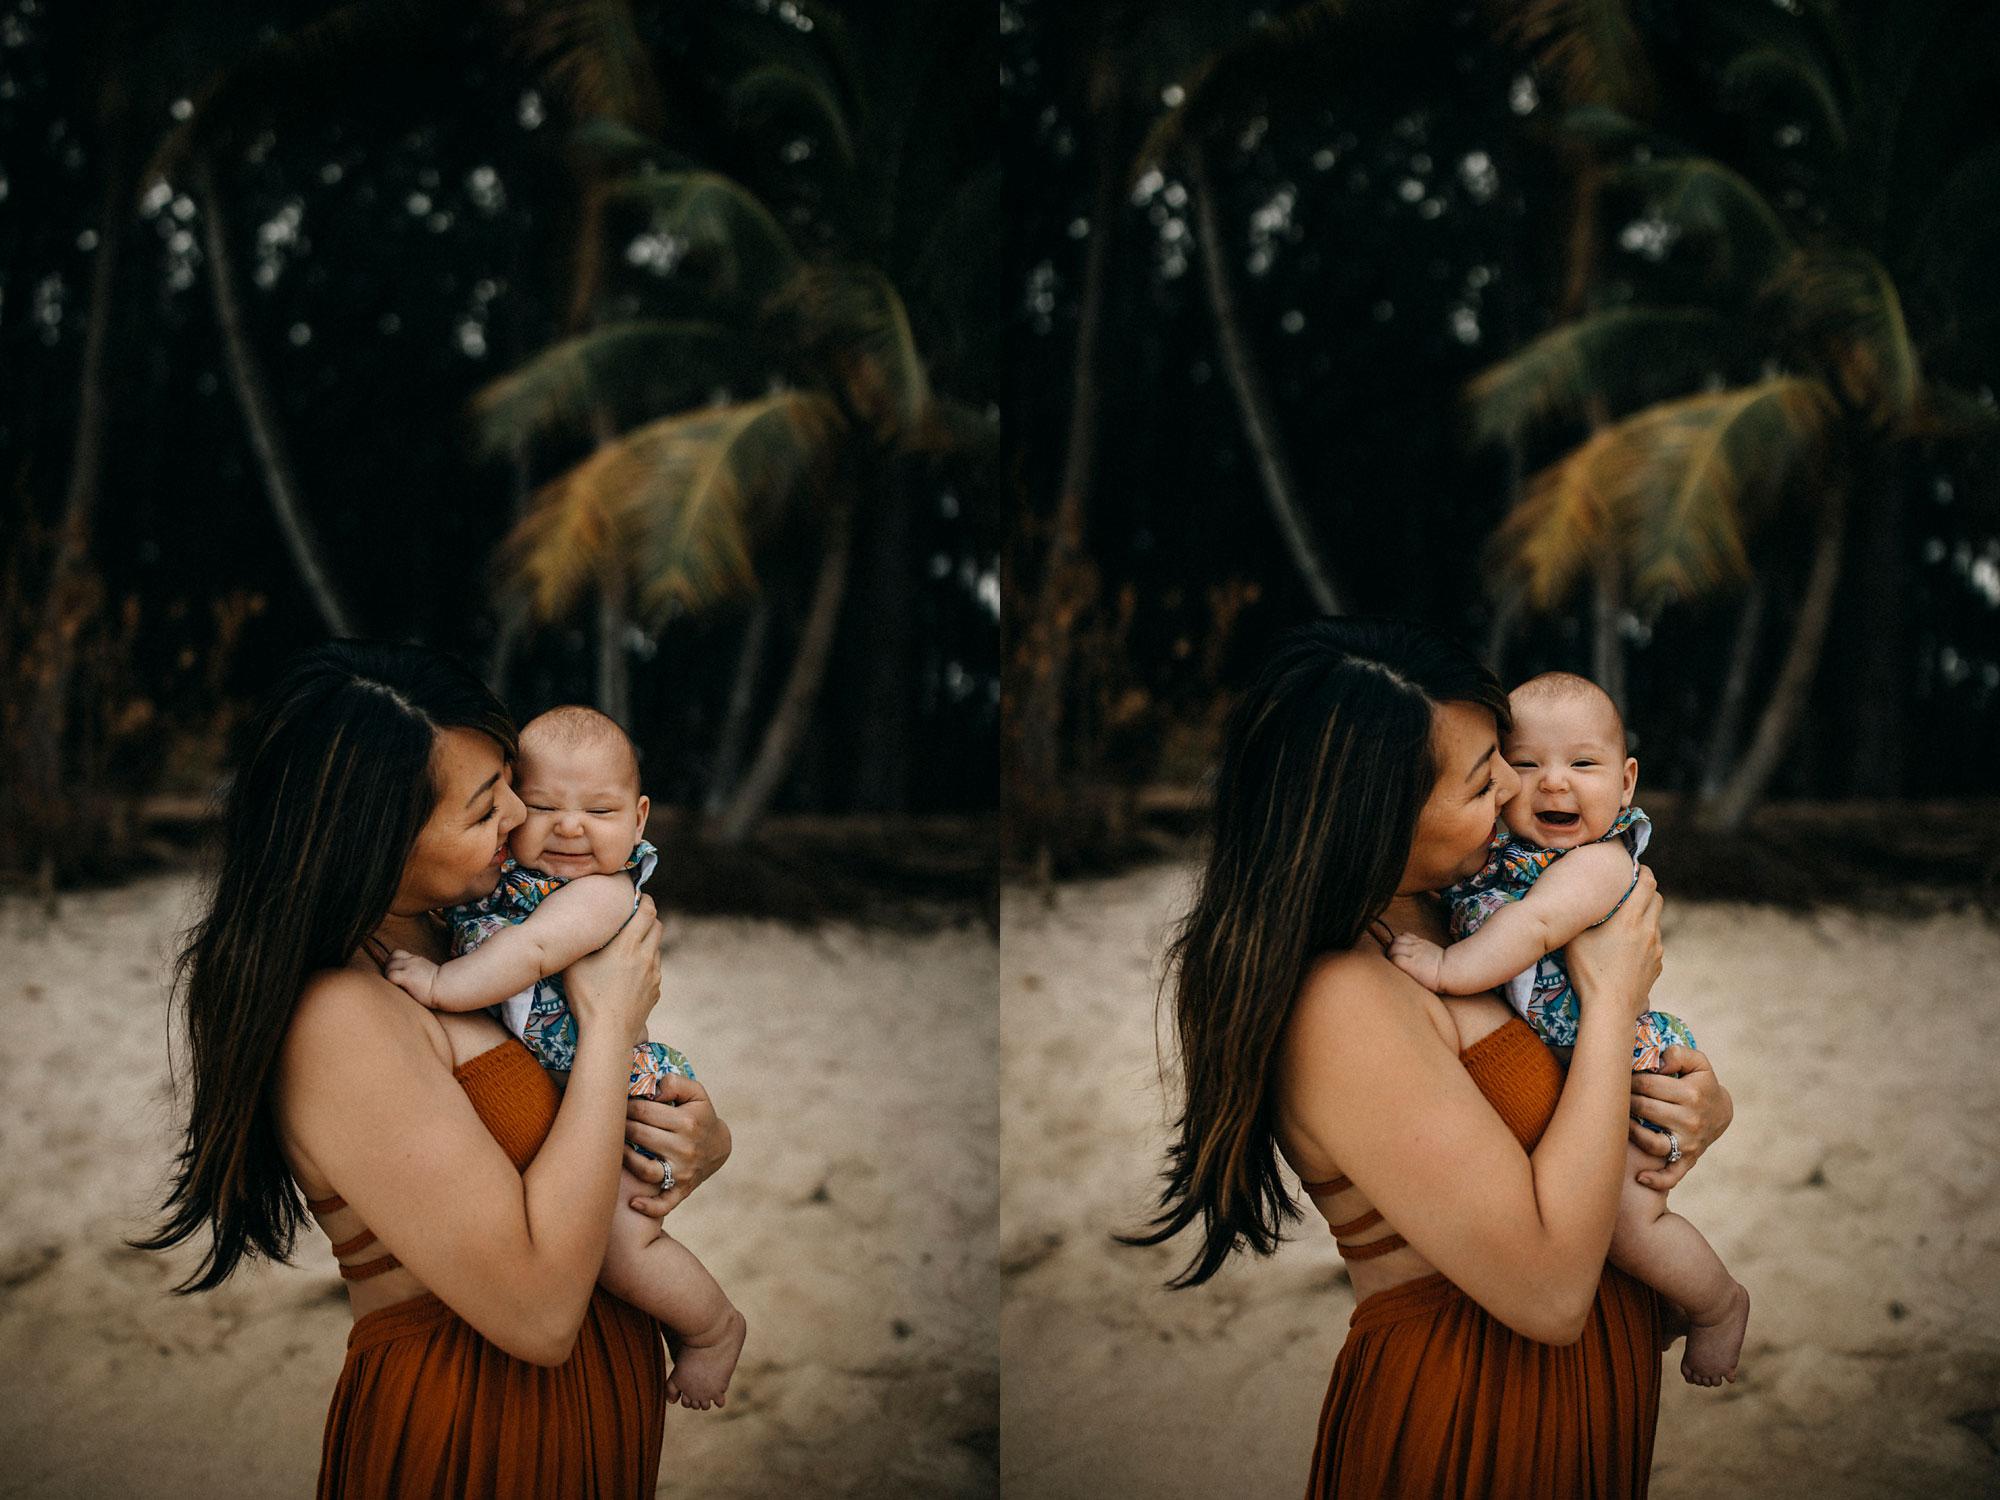 Family-Photographer-North-Shore-Oahu-Hawaii-11.jpg